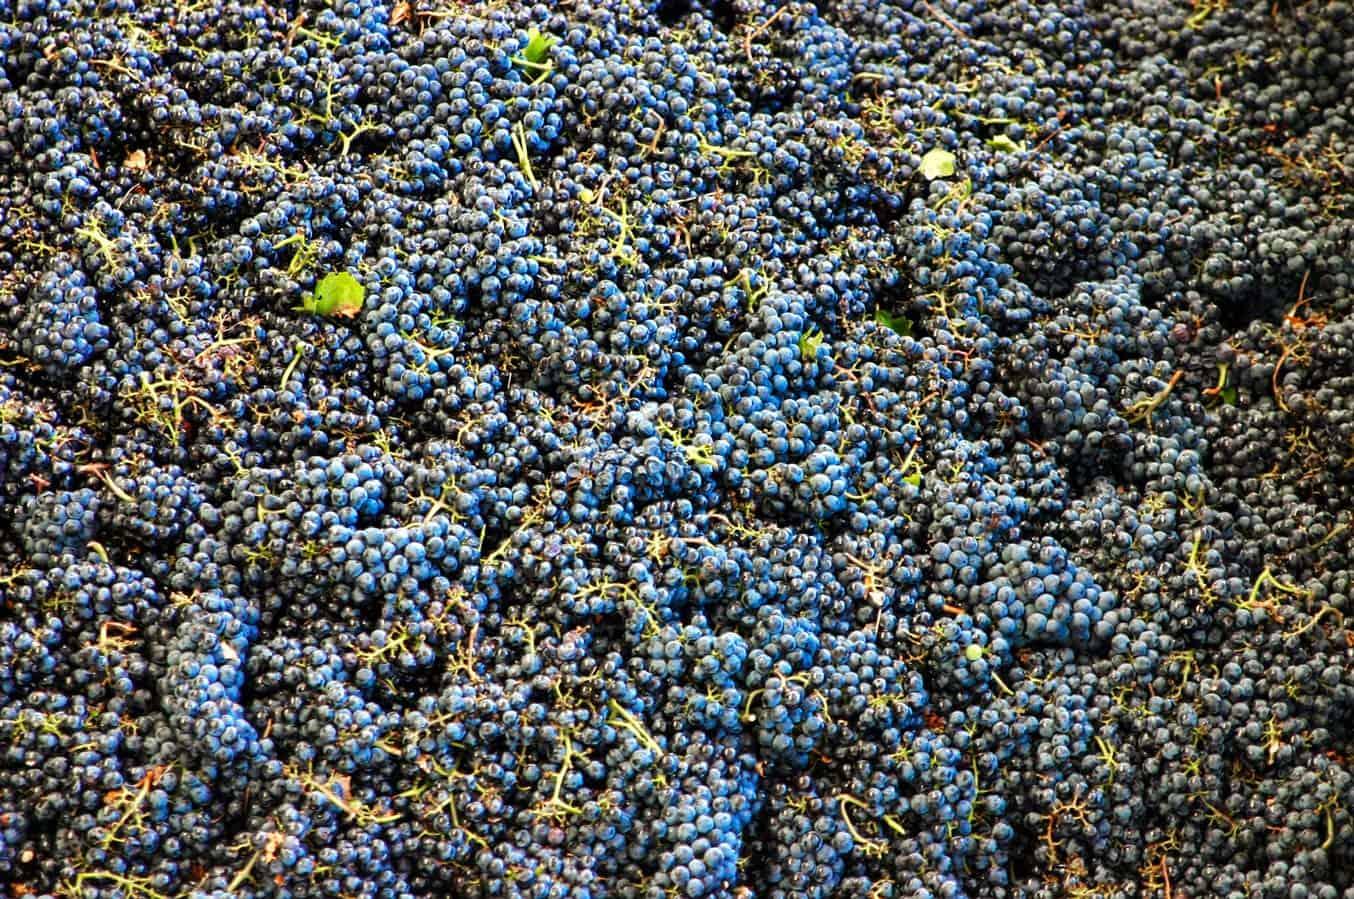 uva, Vigneti a Sorgono in Sardegna - Cantina del Mandrolisai